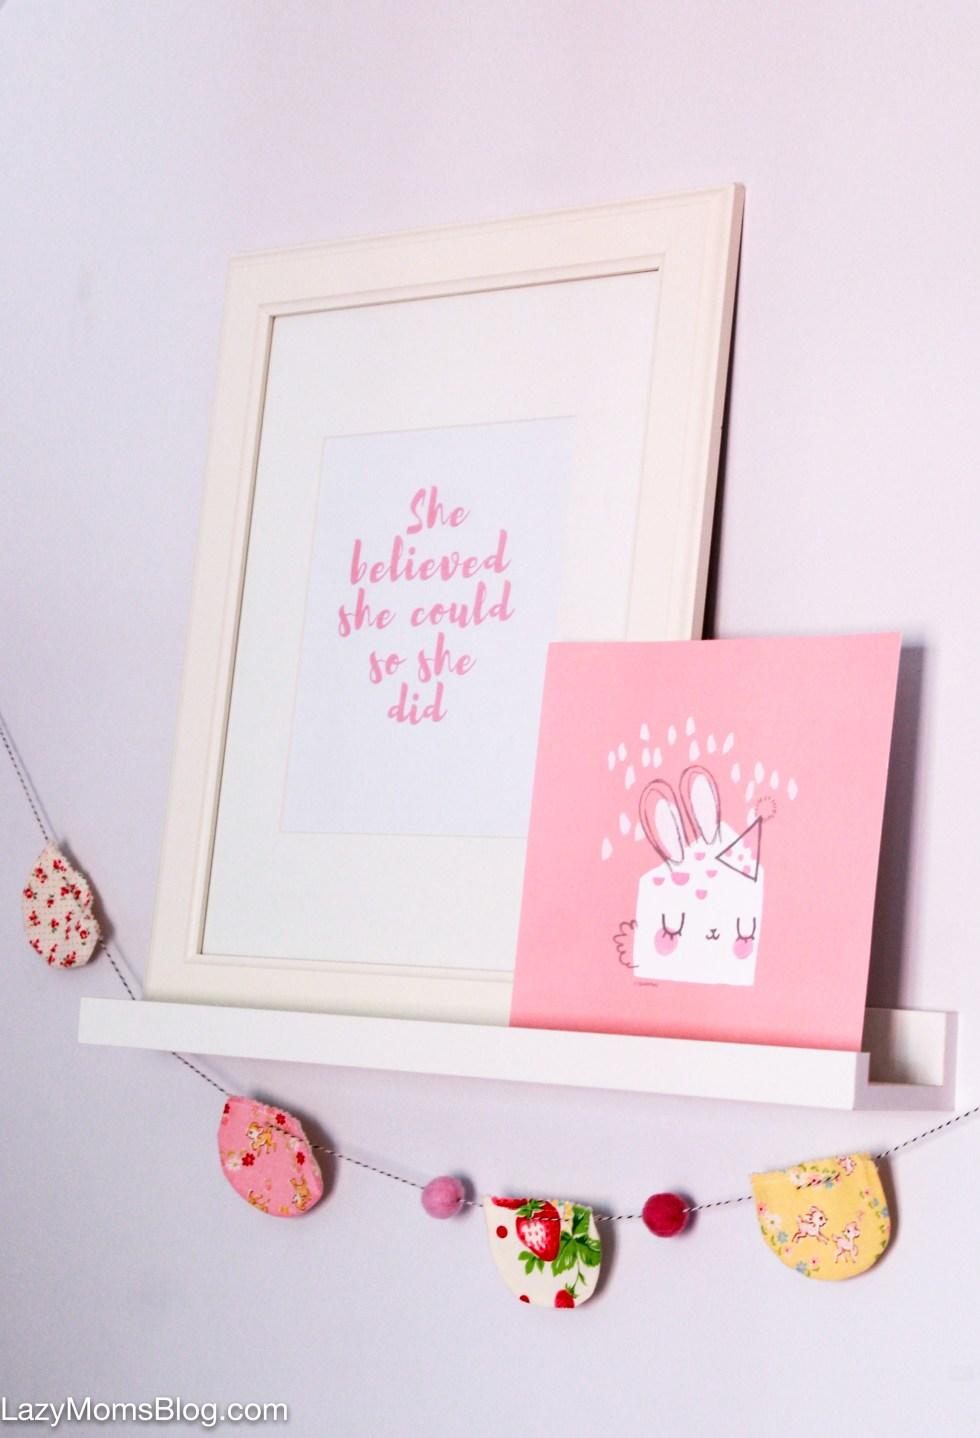 DIY inspiring quote prints